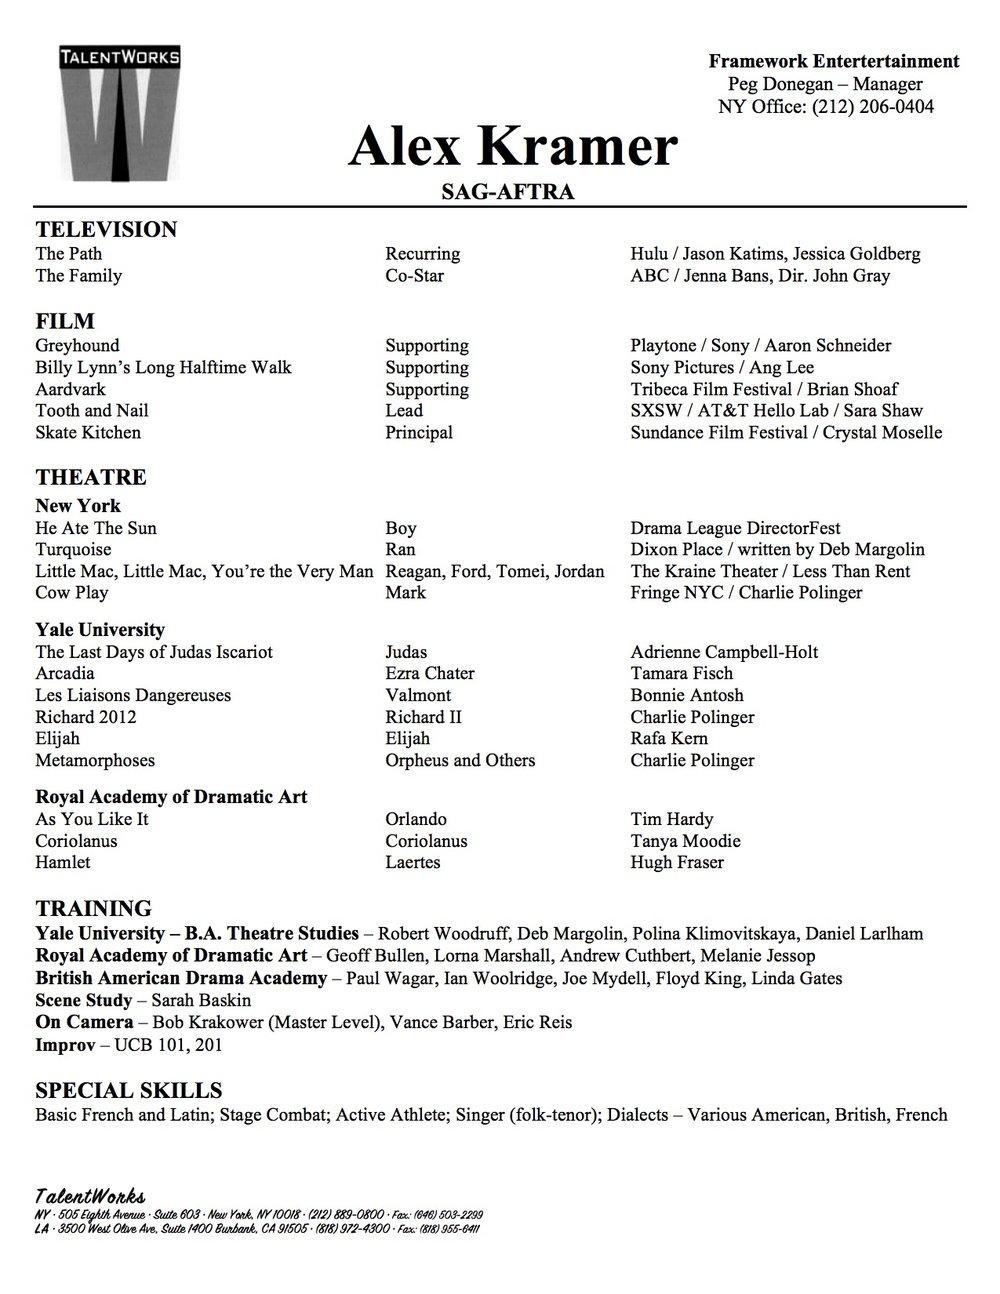 Alex Kramer-Resume.jpg